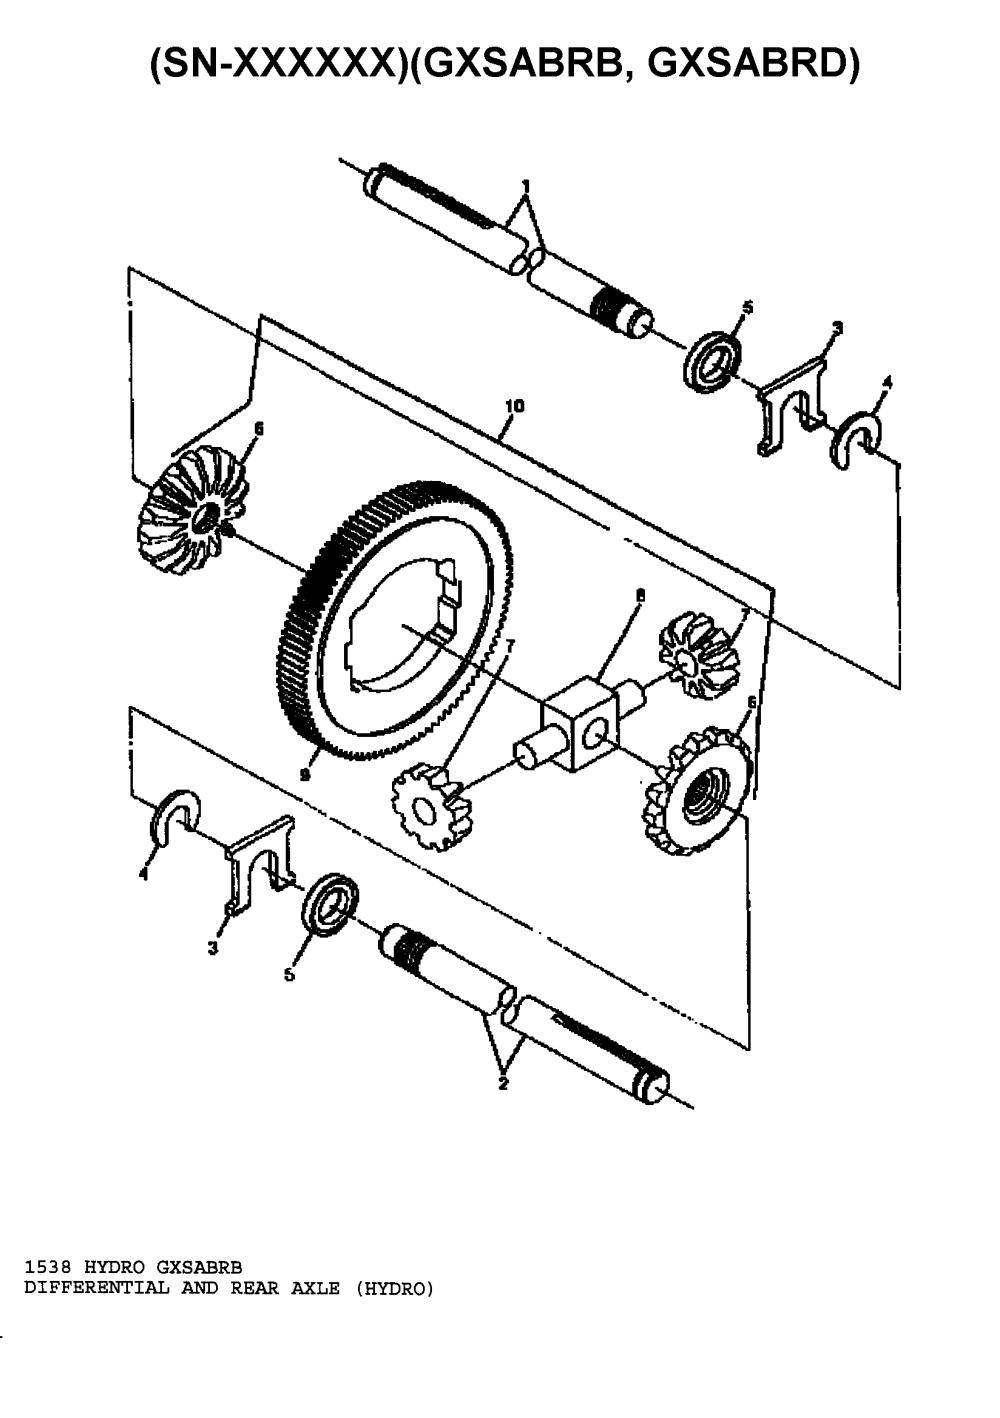 medium resolution of john deere sabre gear wiring diagram john deere sabre john deere 1338 sabre gear wiring diagram